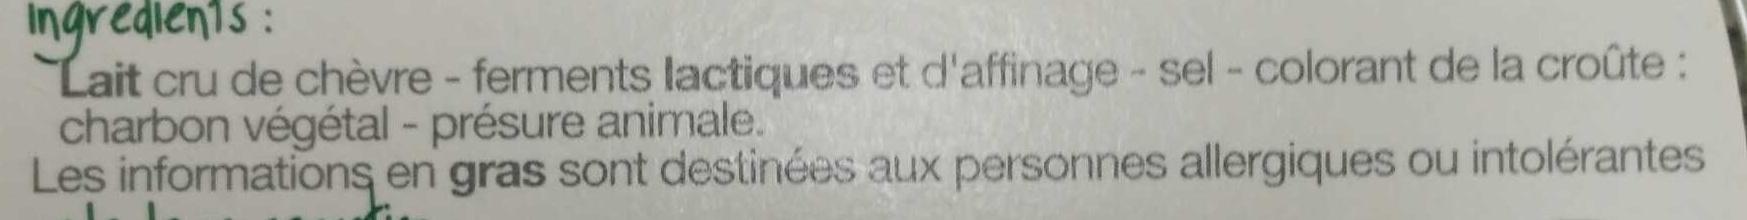 Selles-sur-Cher - Ingrediënten